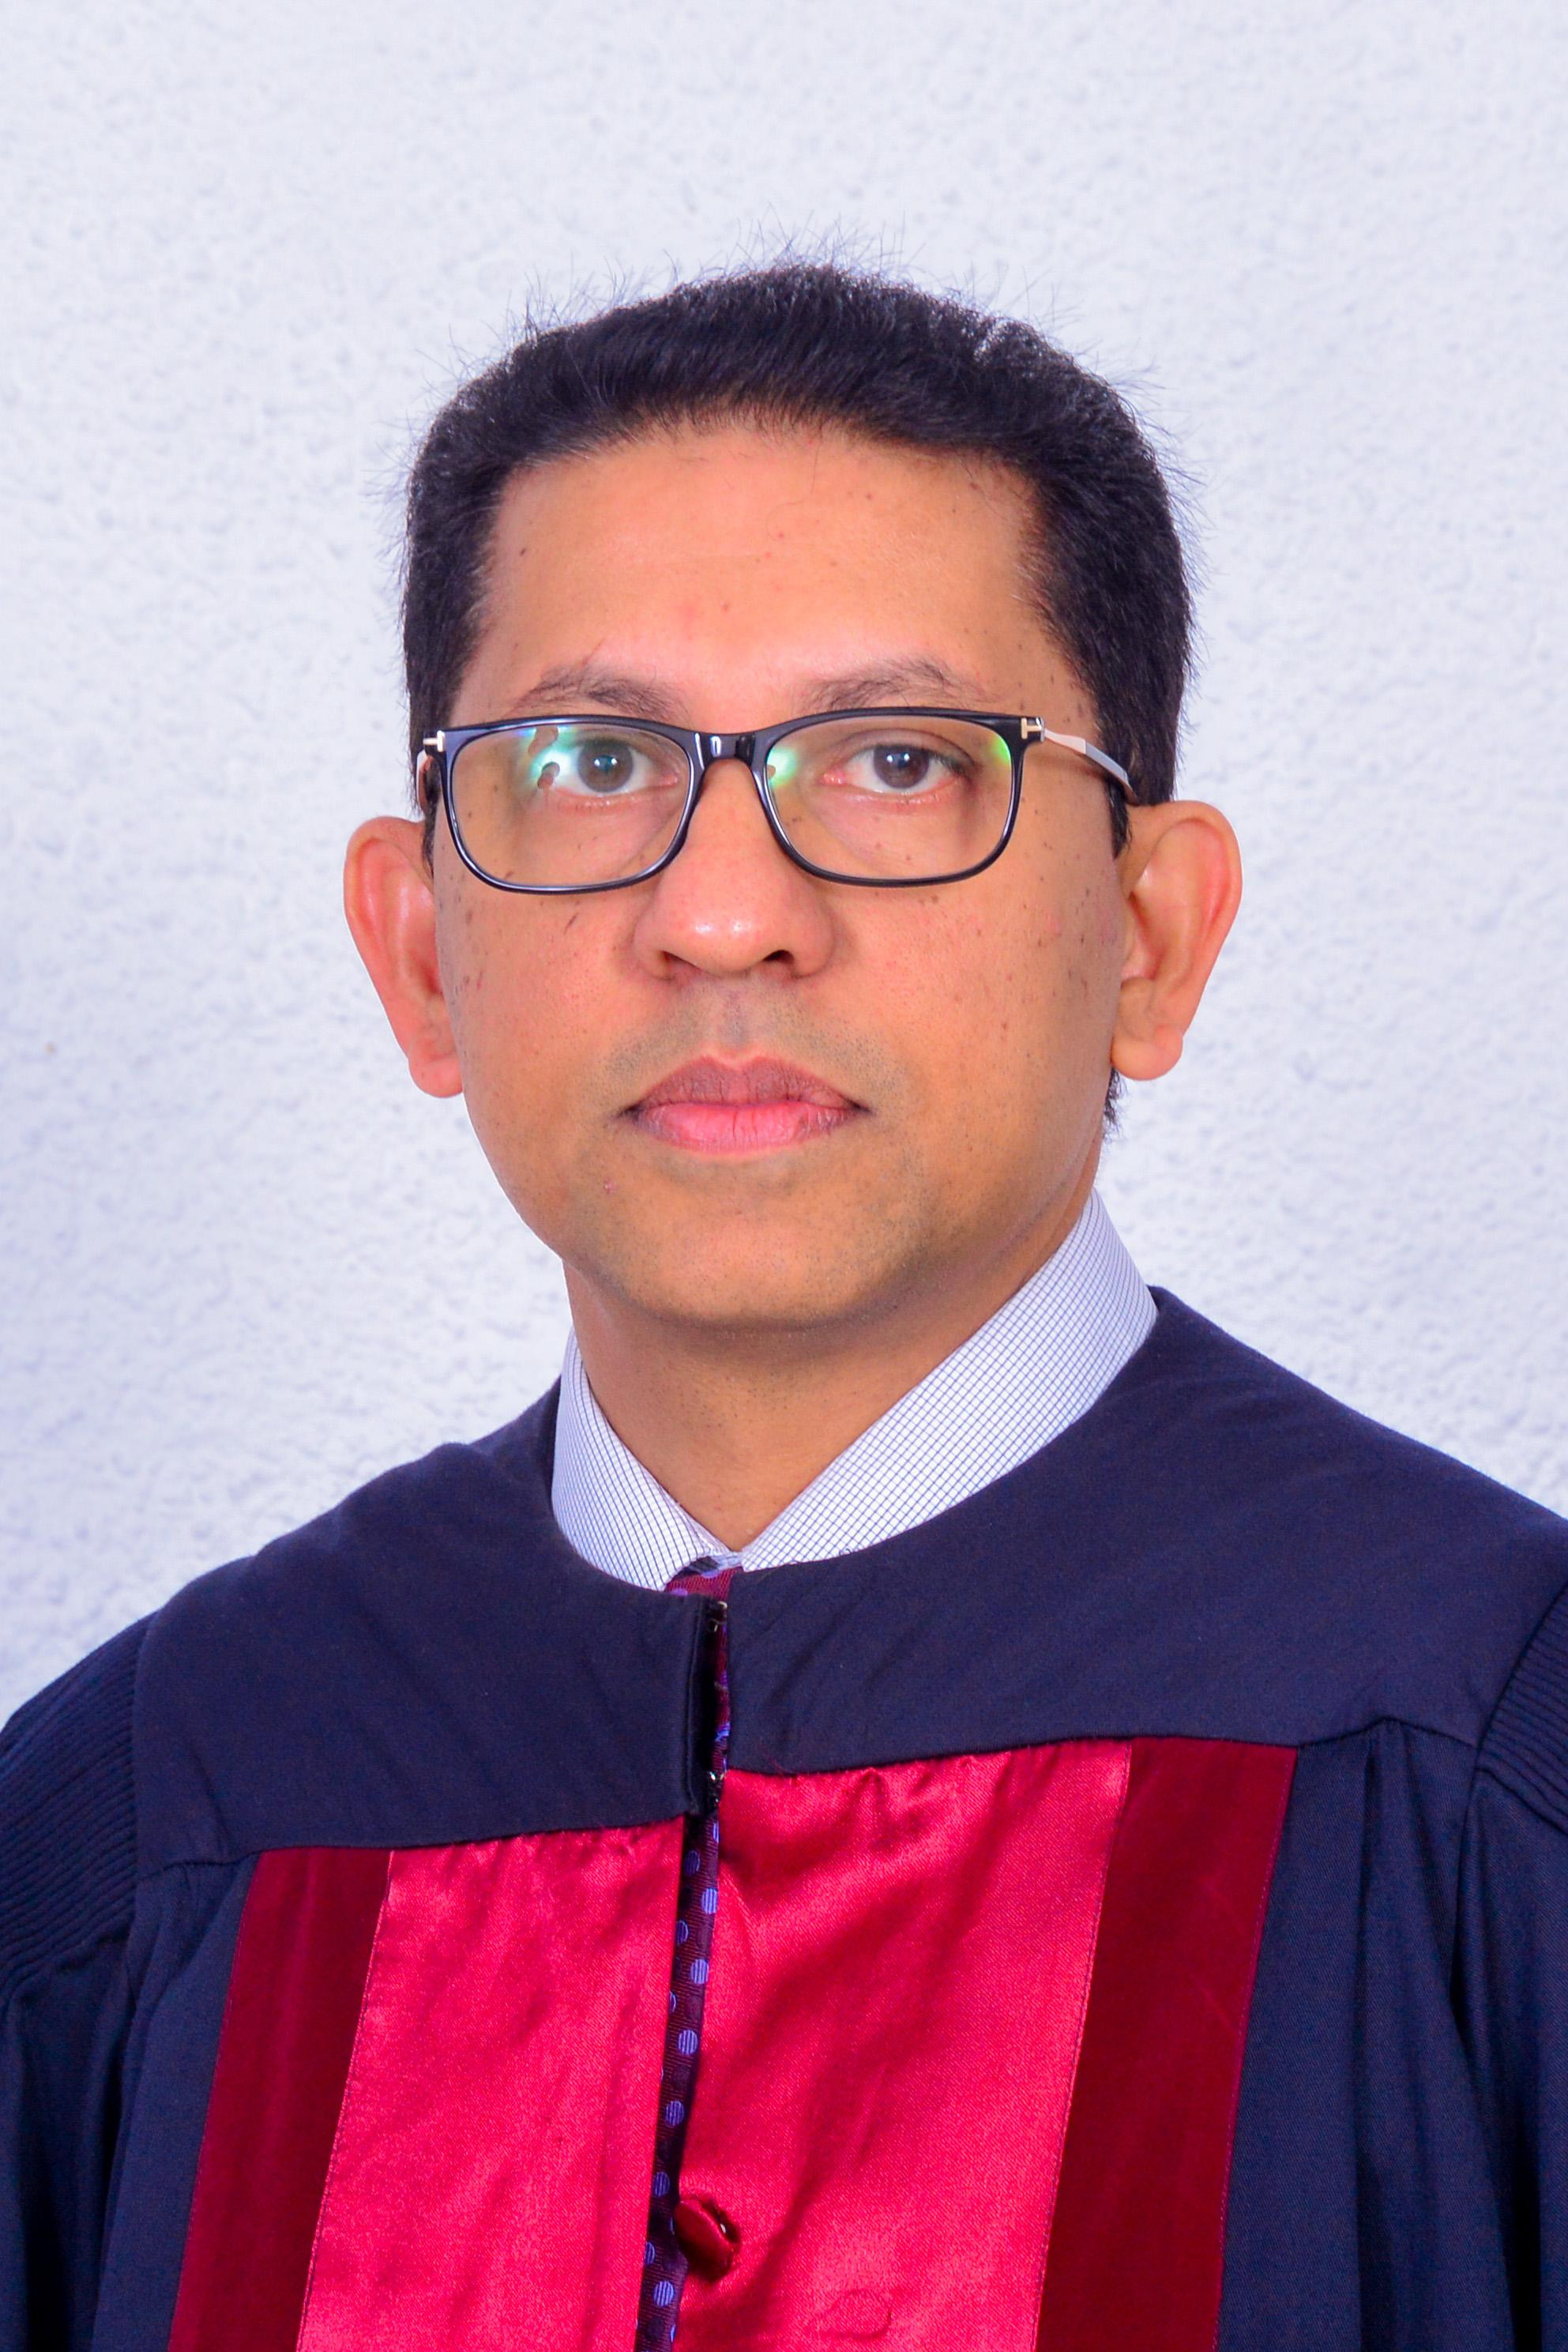 Dr. Surantha Perera